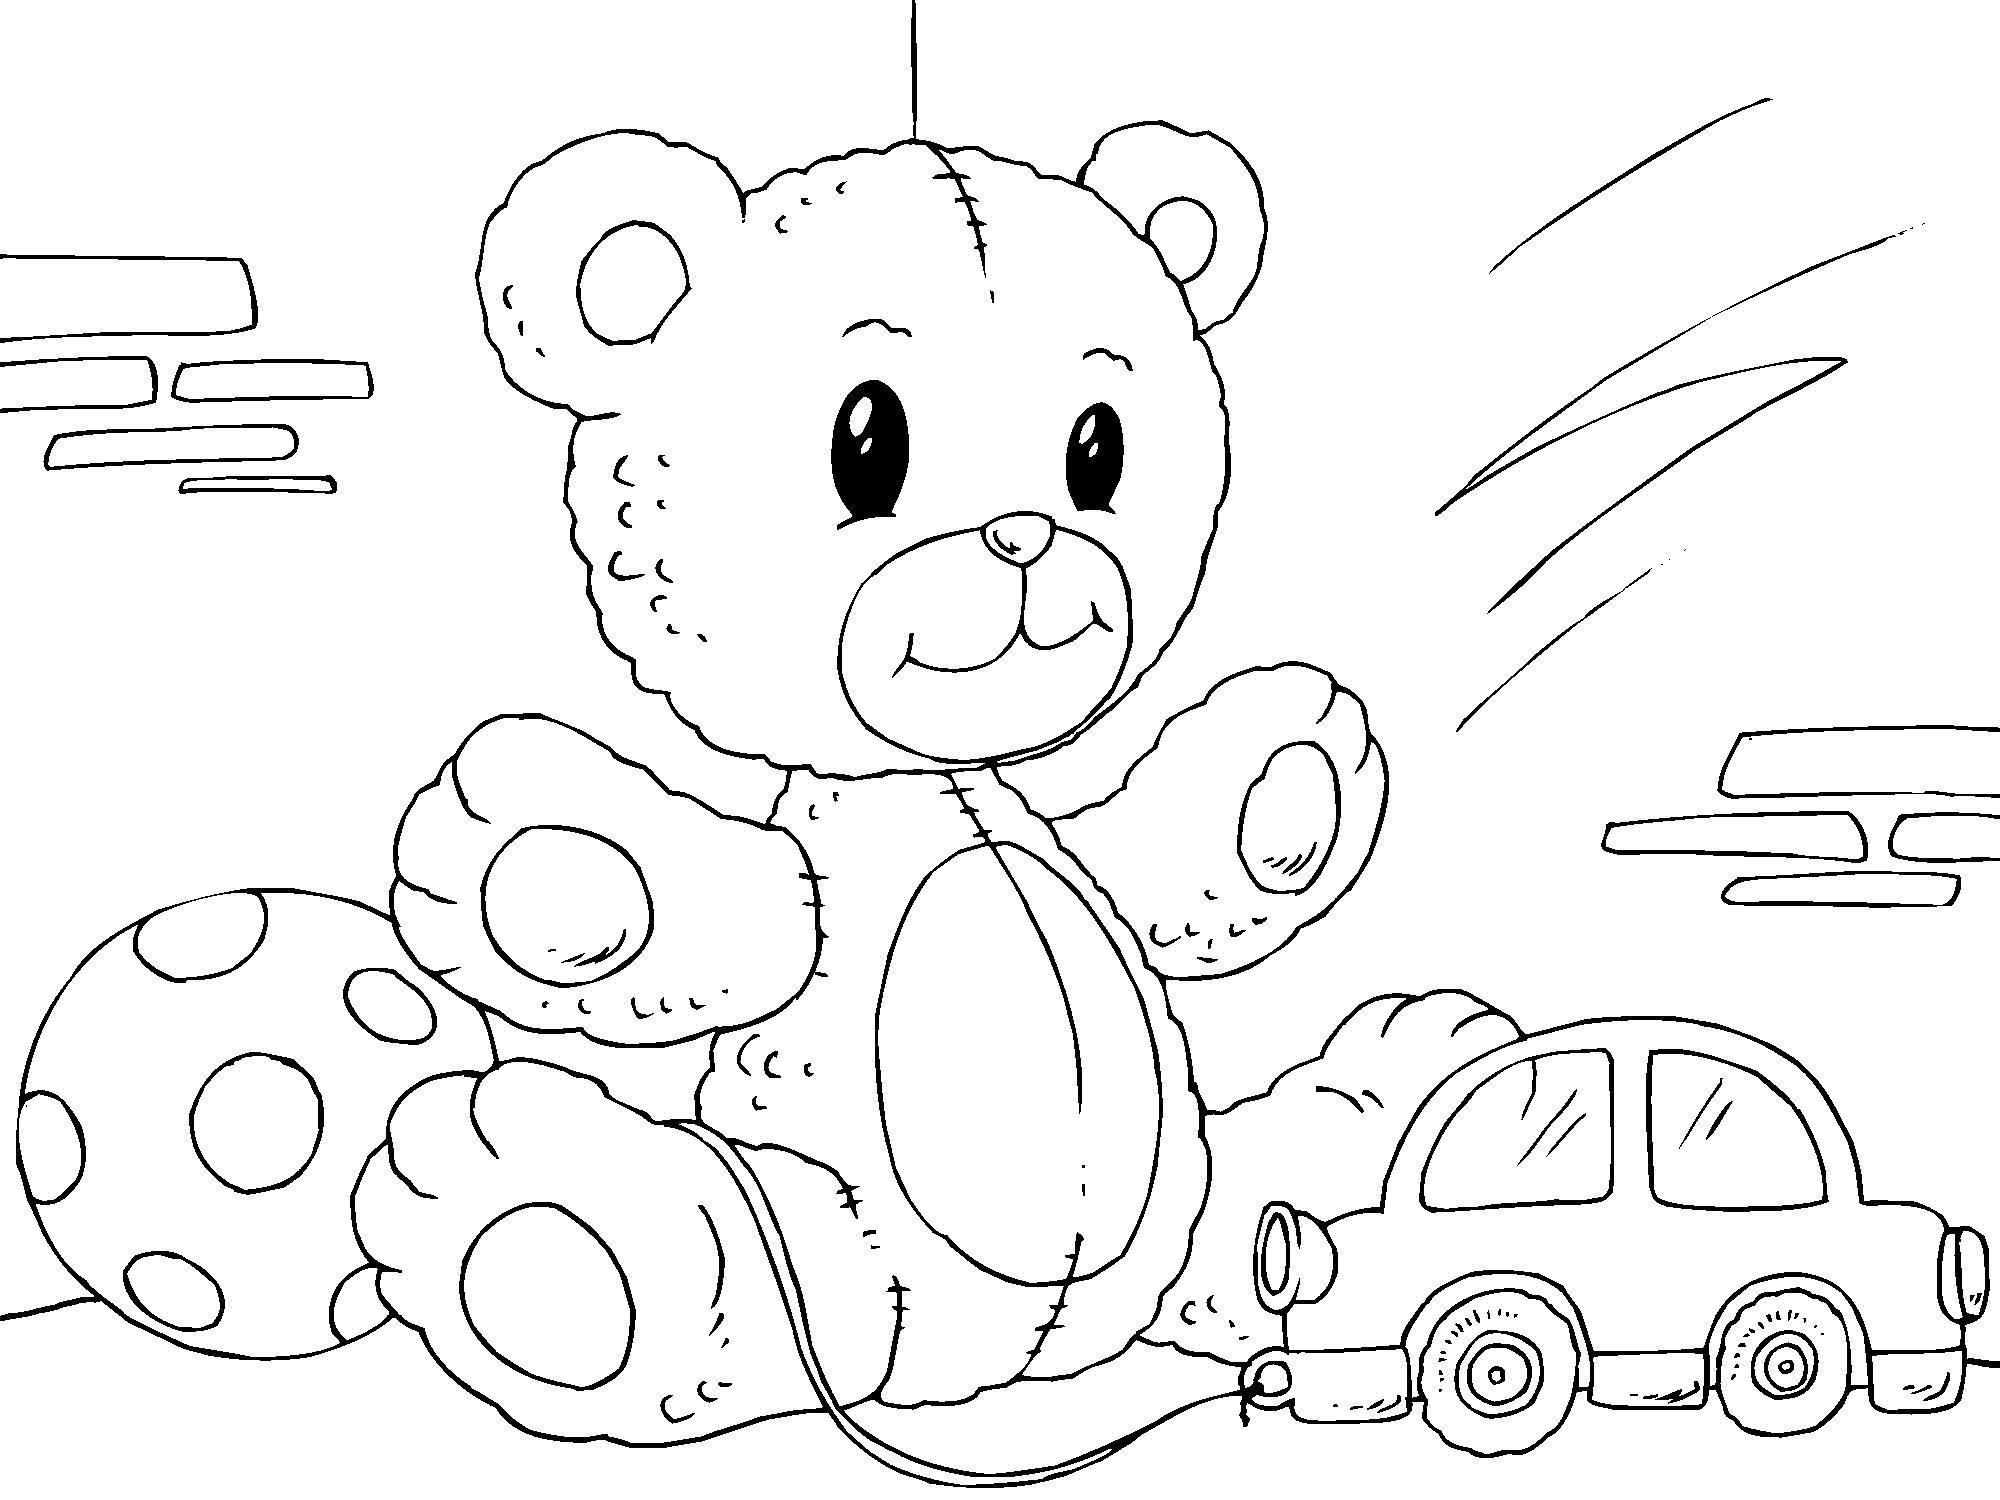 Malvorlage Teddybär | Ausmalbild 22822.